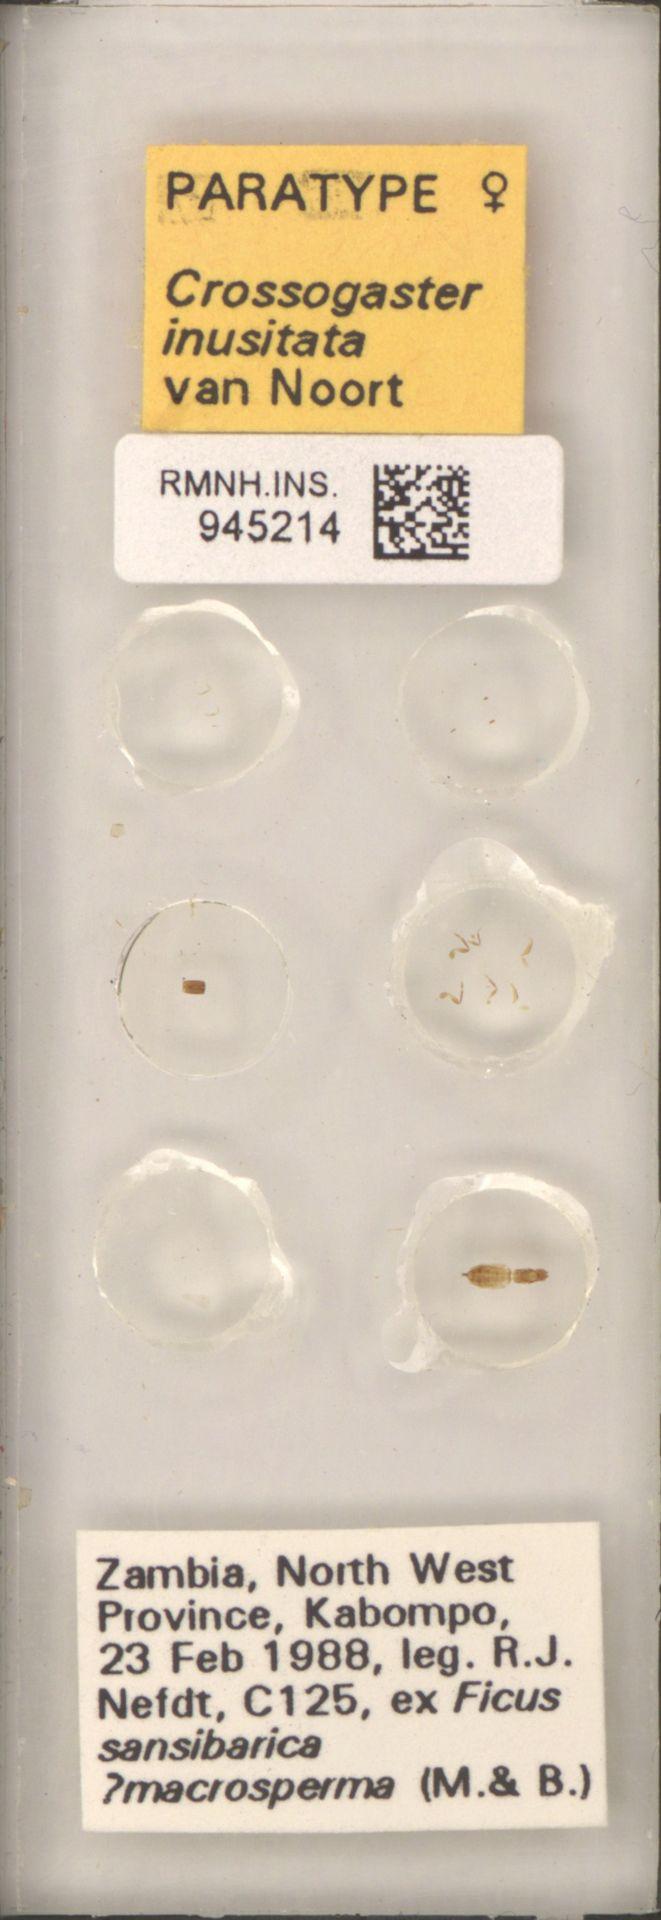 RMNH.INS.945214   Crossogaster inusitata van Noort